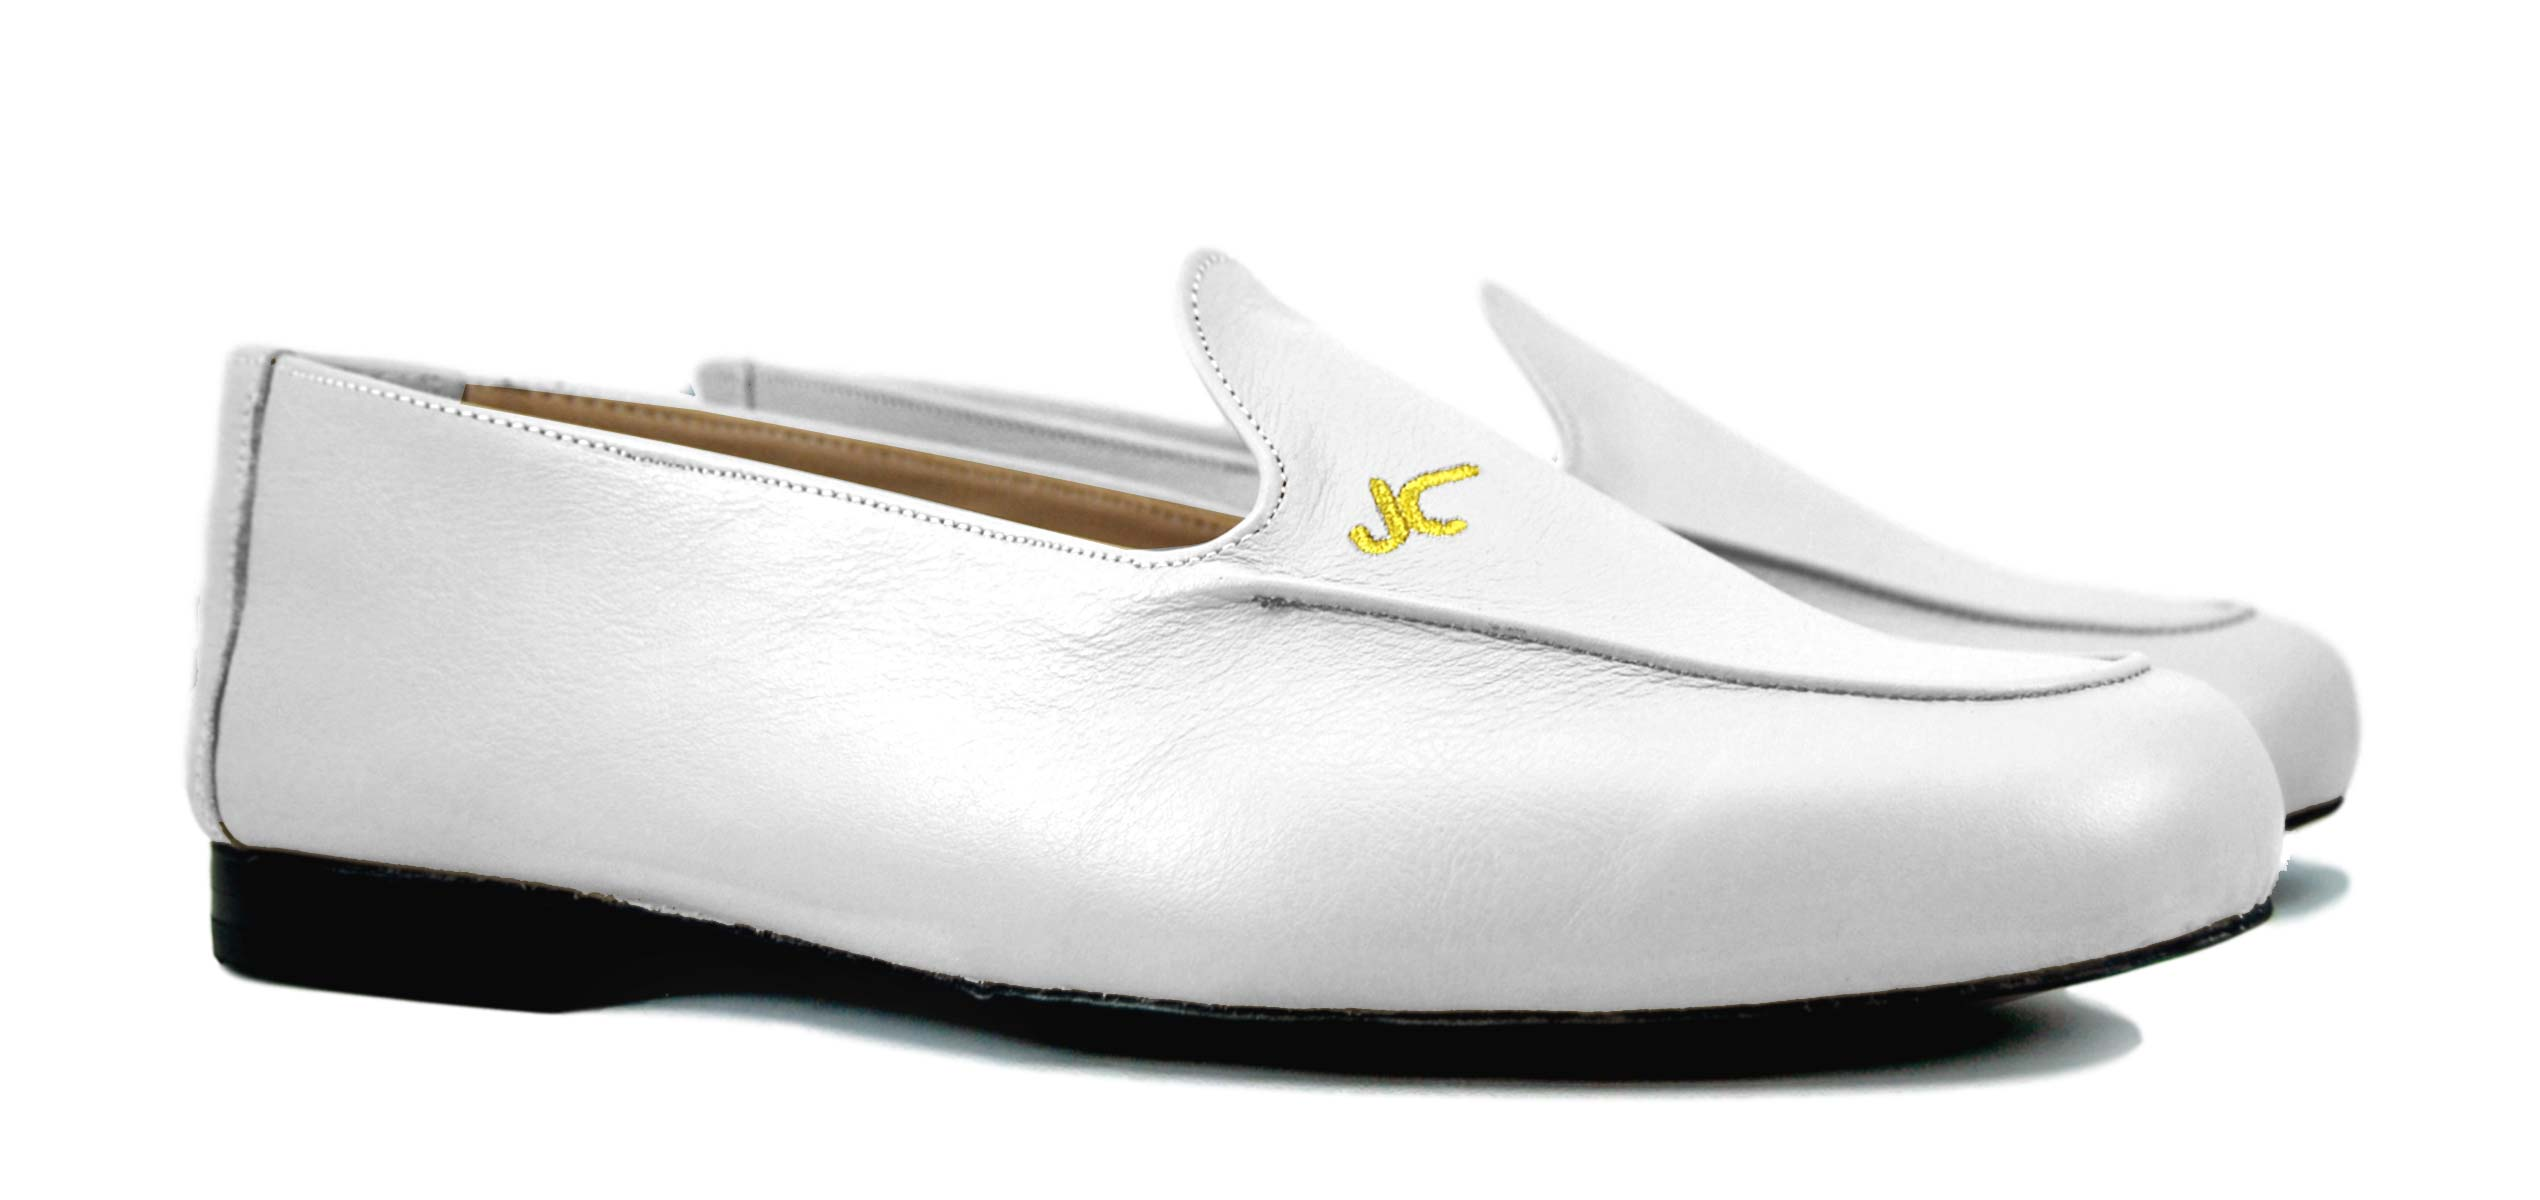 Foto 5 de Zapatos Julio Iglesias Mocasin 528 JC Blanco Napa